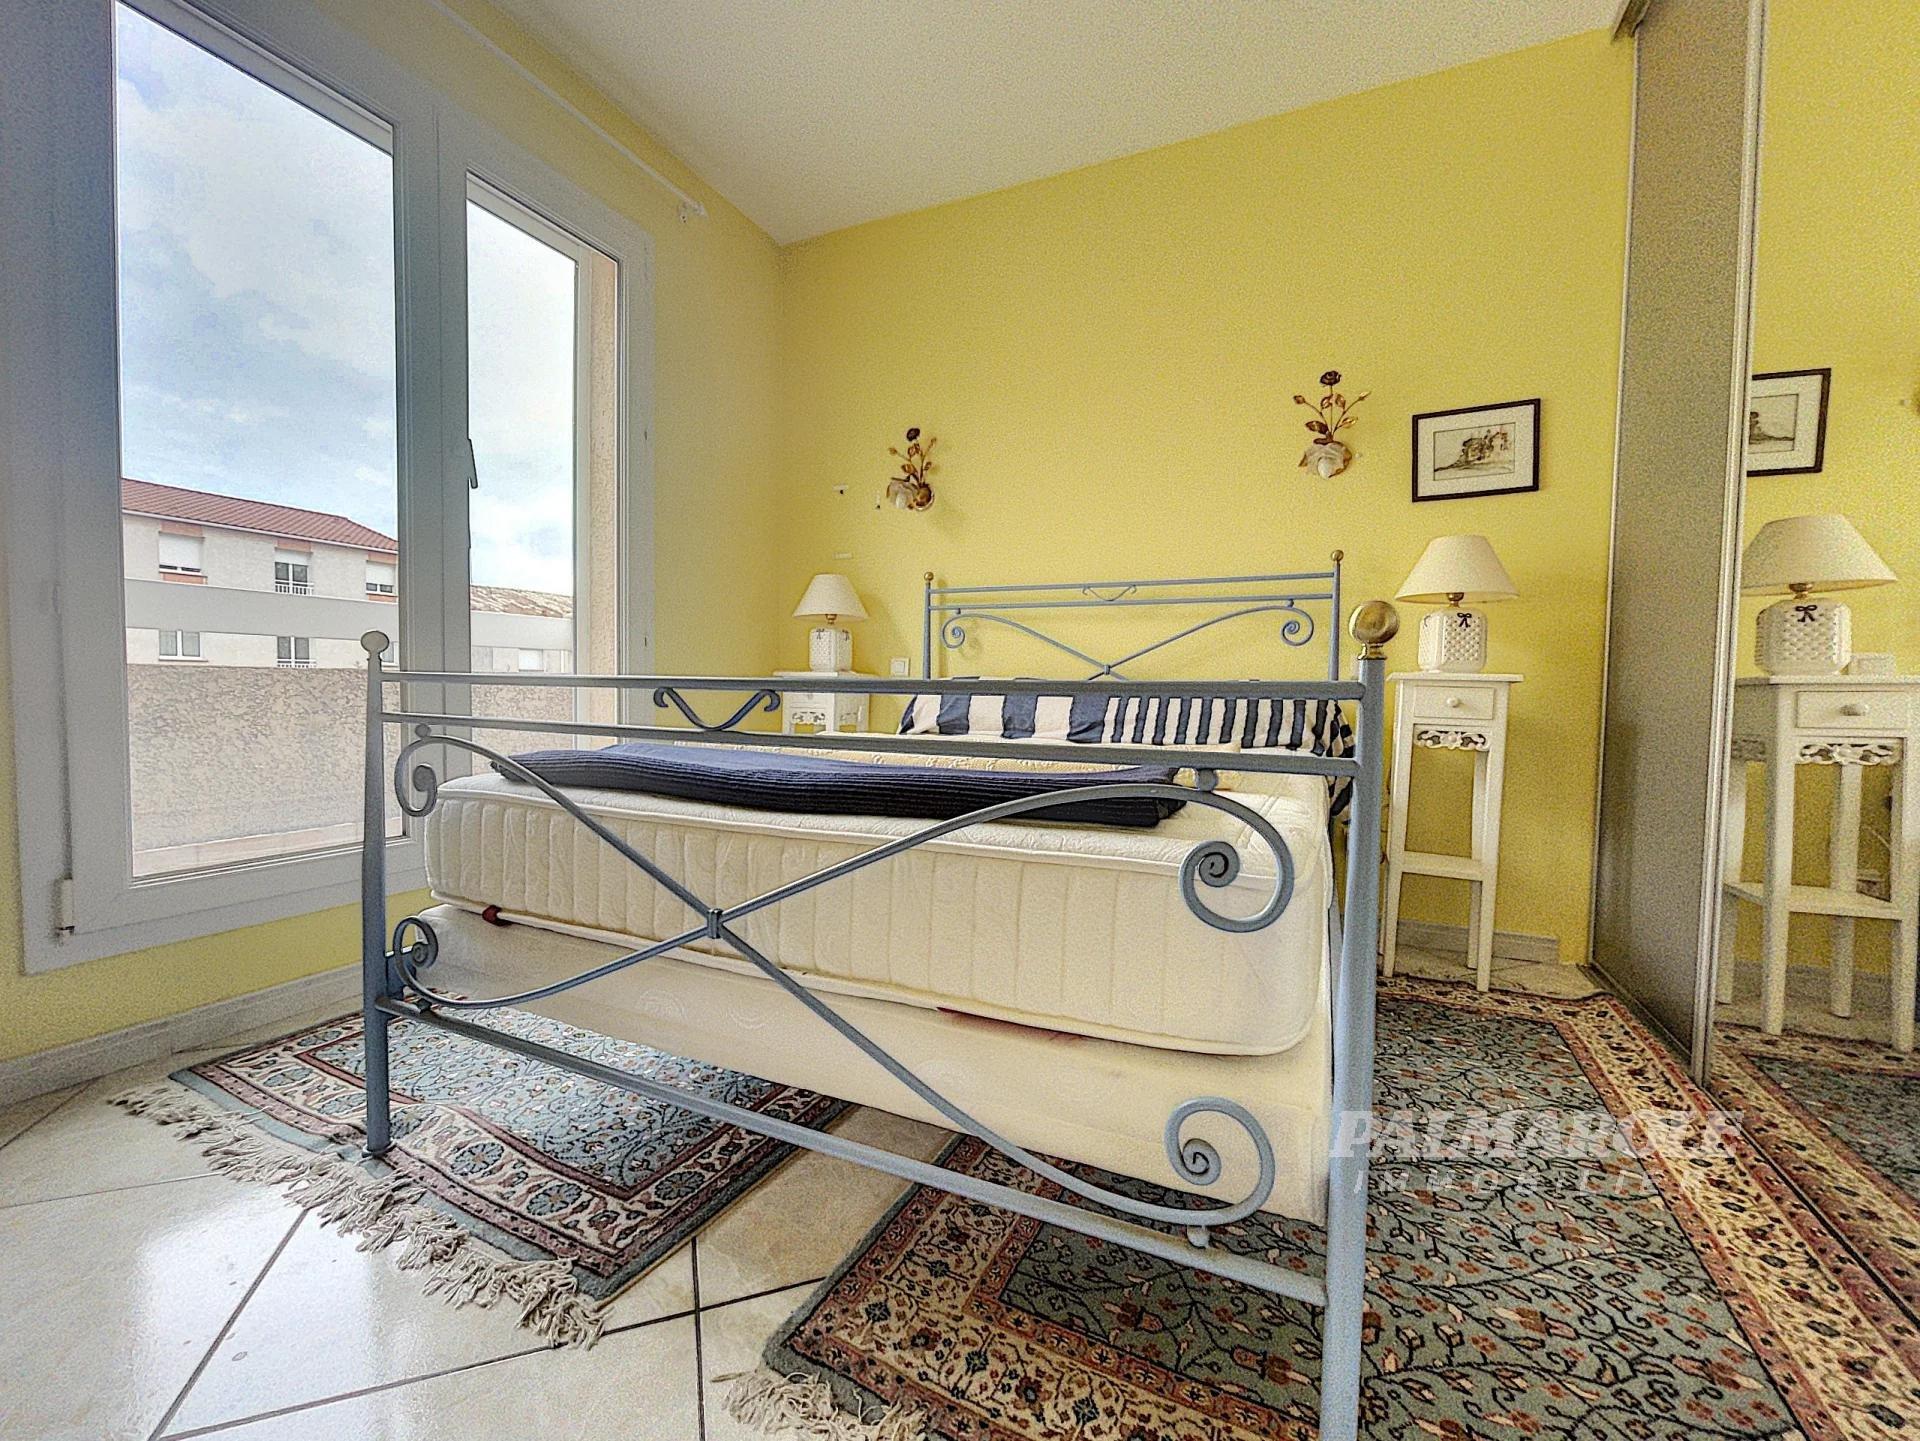 Perpignan sud villa 4 faces avec piscine OCCUPEE VENTE NUE PROPRIETE